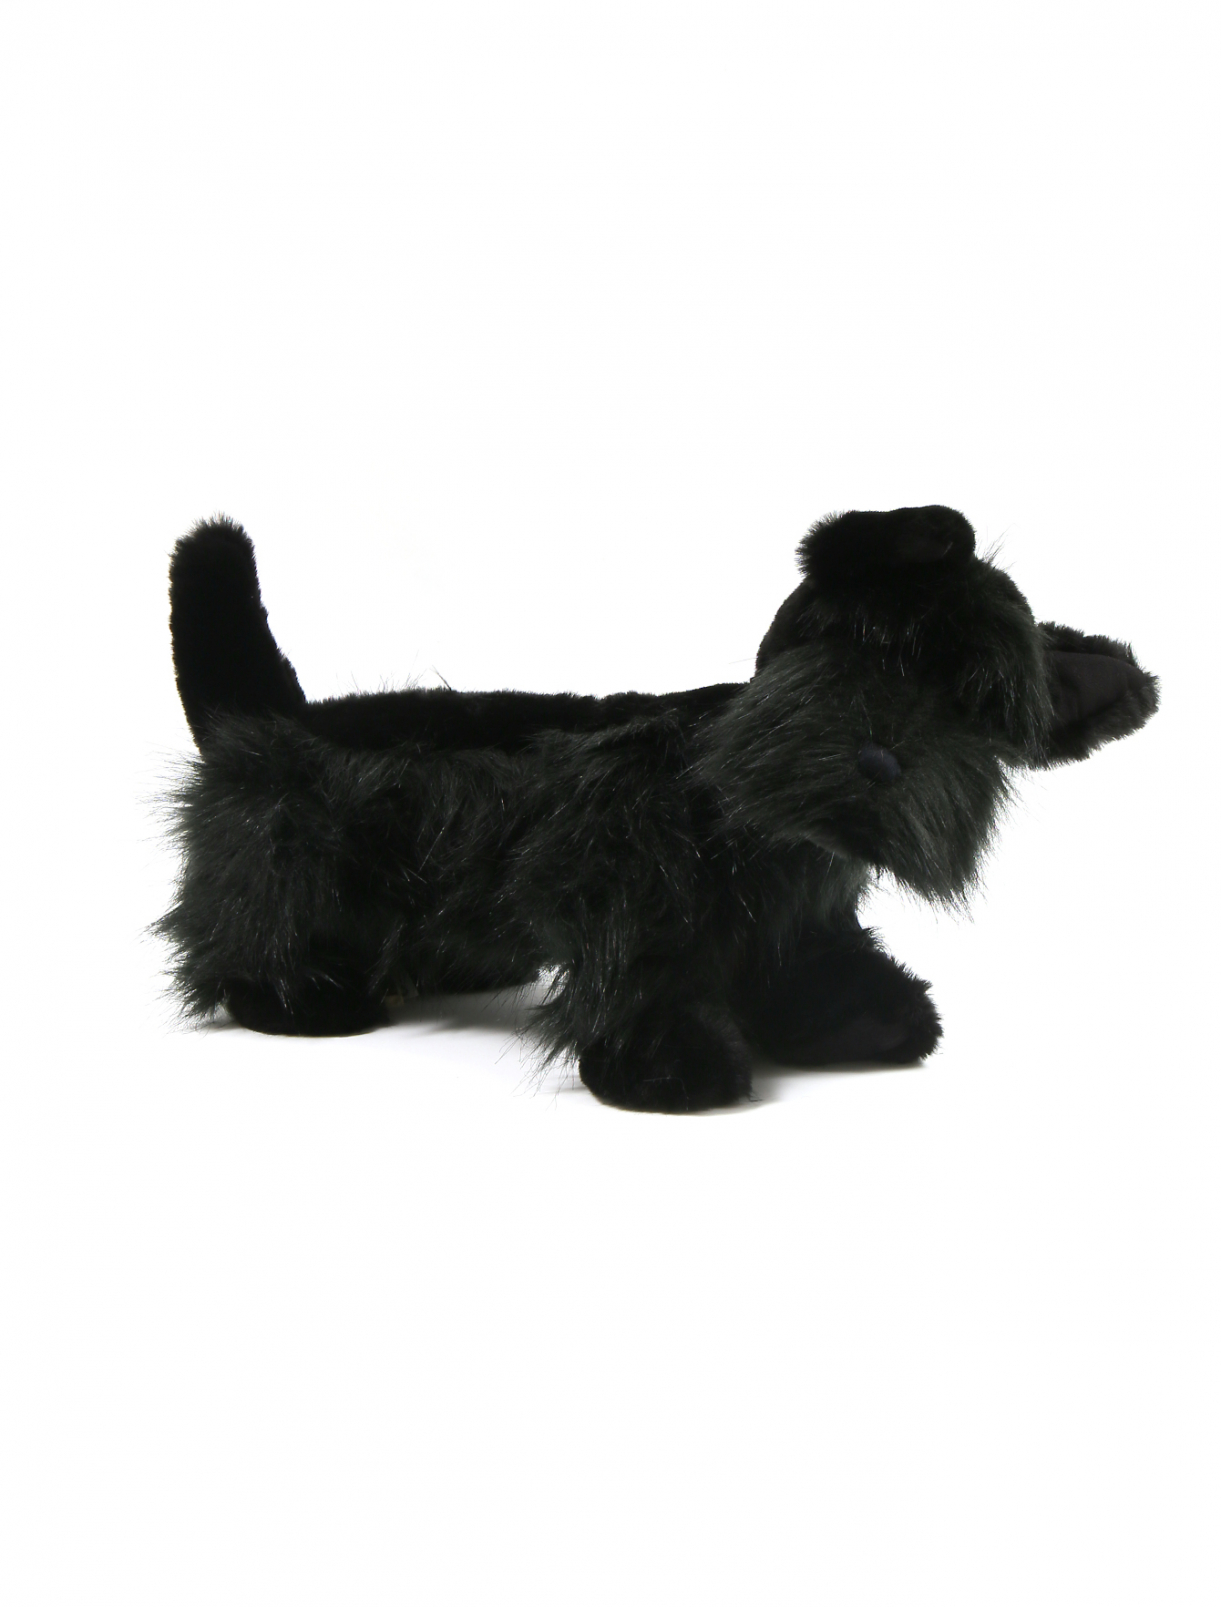 Пушистая плюшевая собака Charlie Bears  –  Общий вид